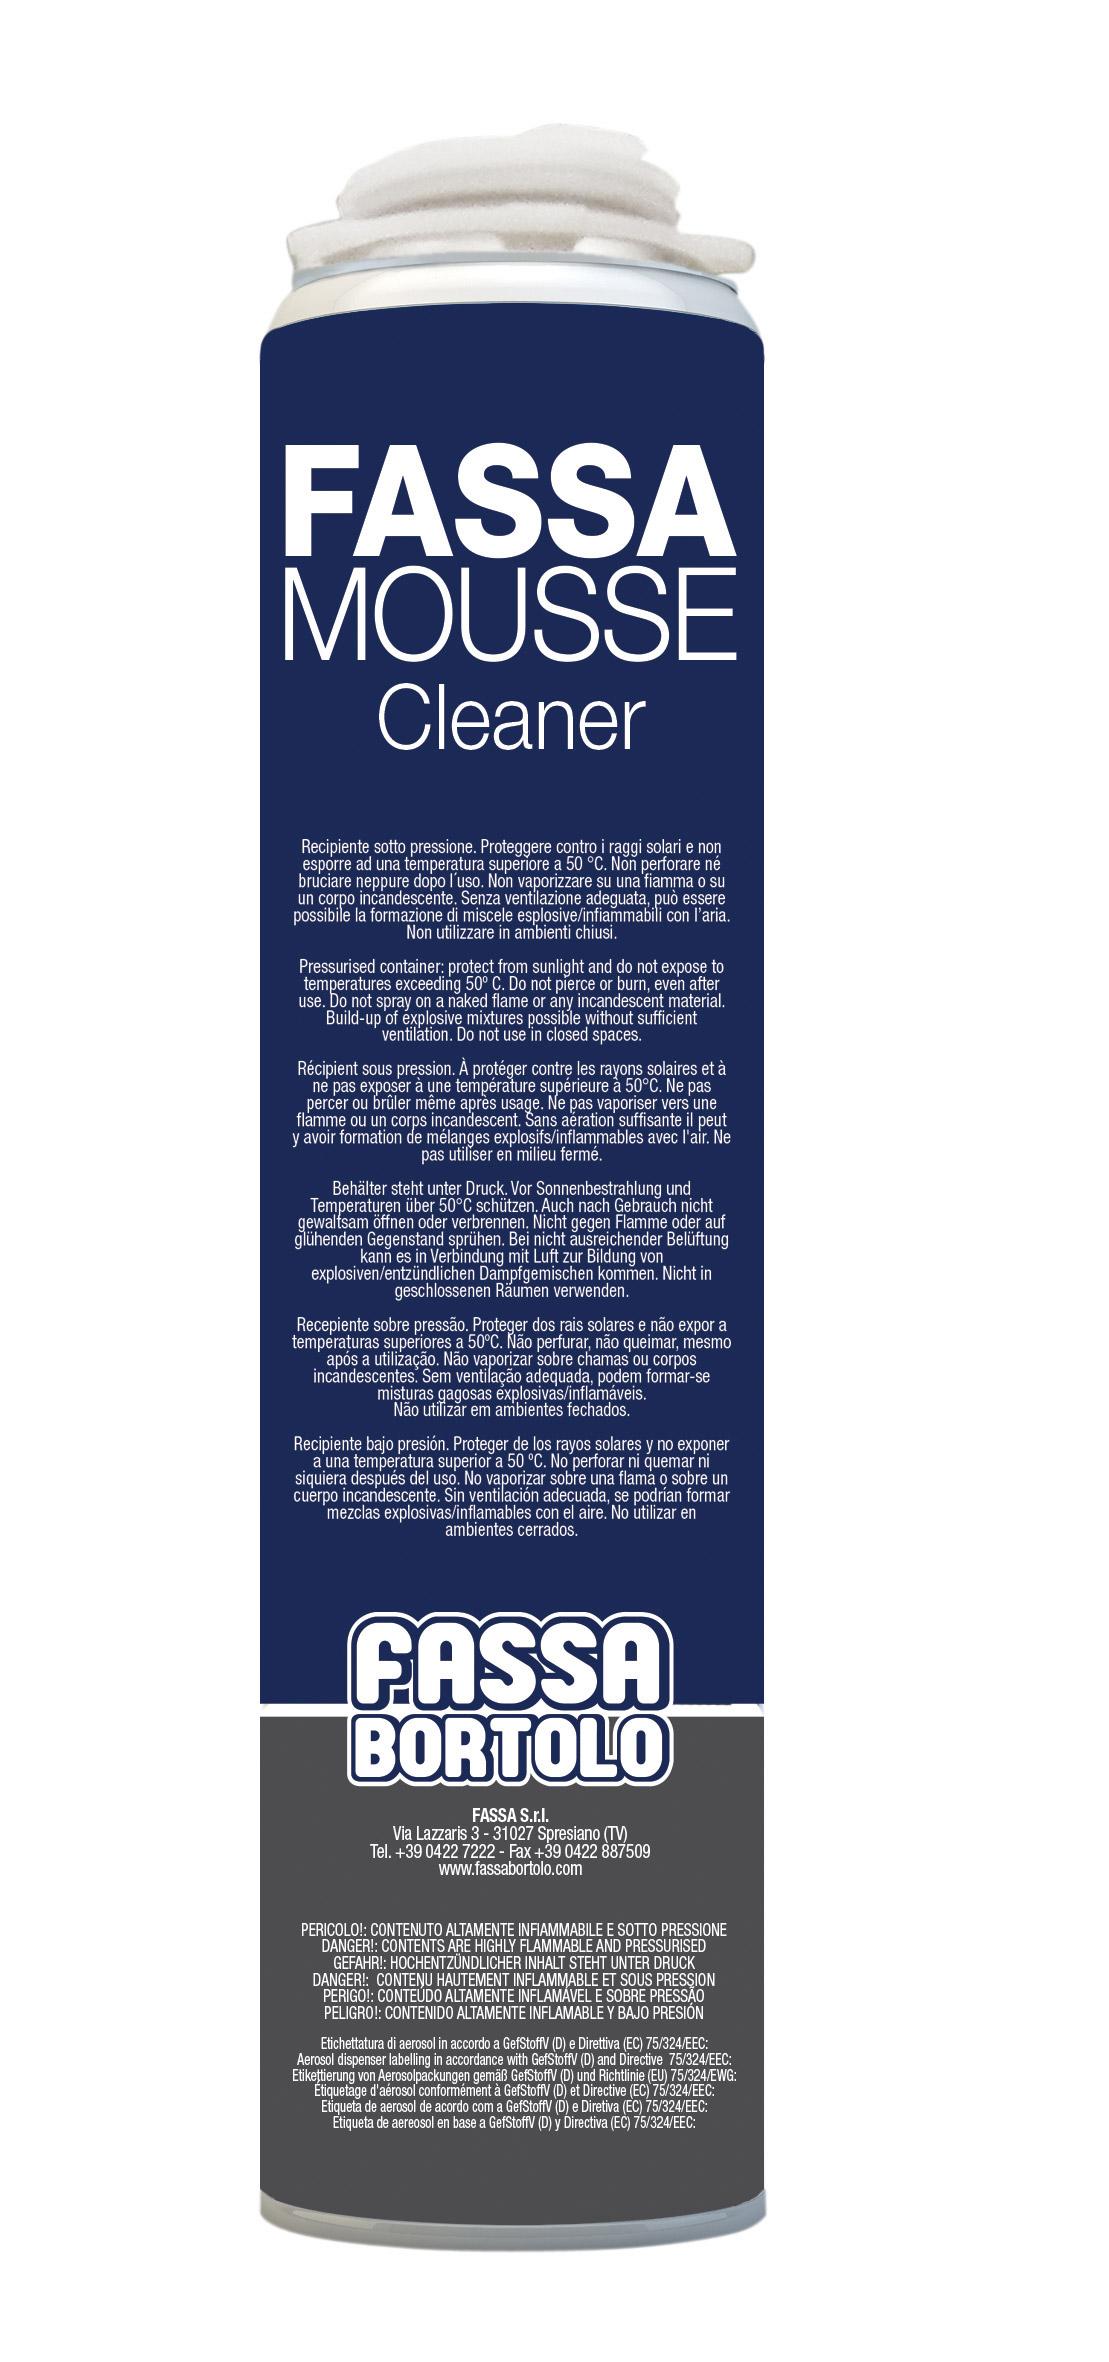 FASSA MOUSSE CLEANER: Detergente per pistola FASSA MOUSSE